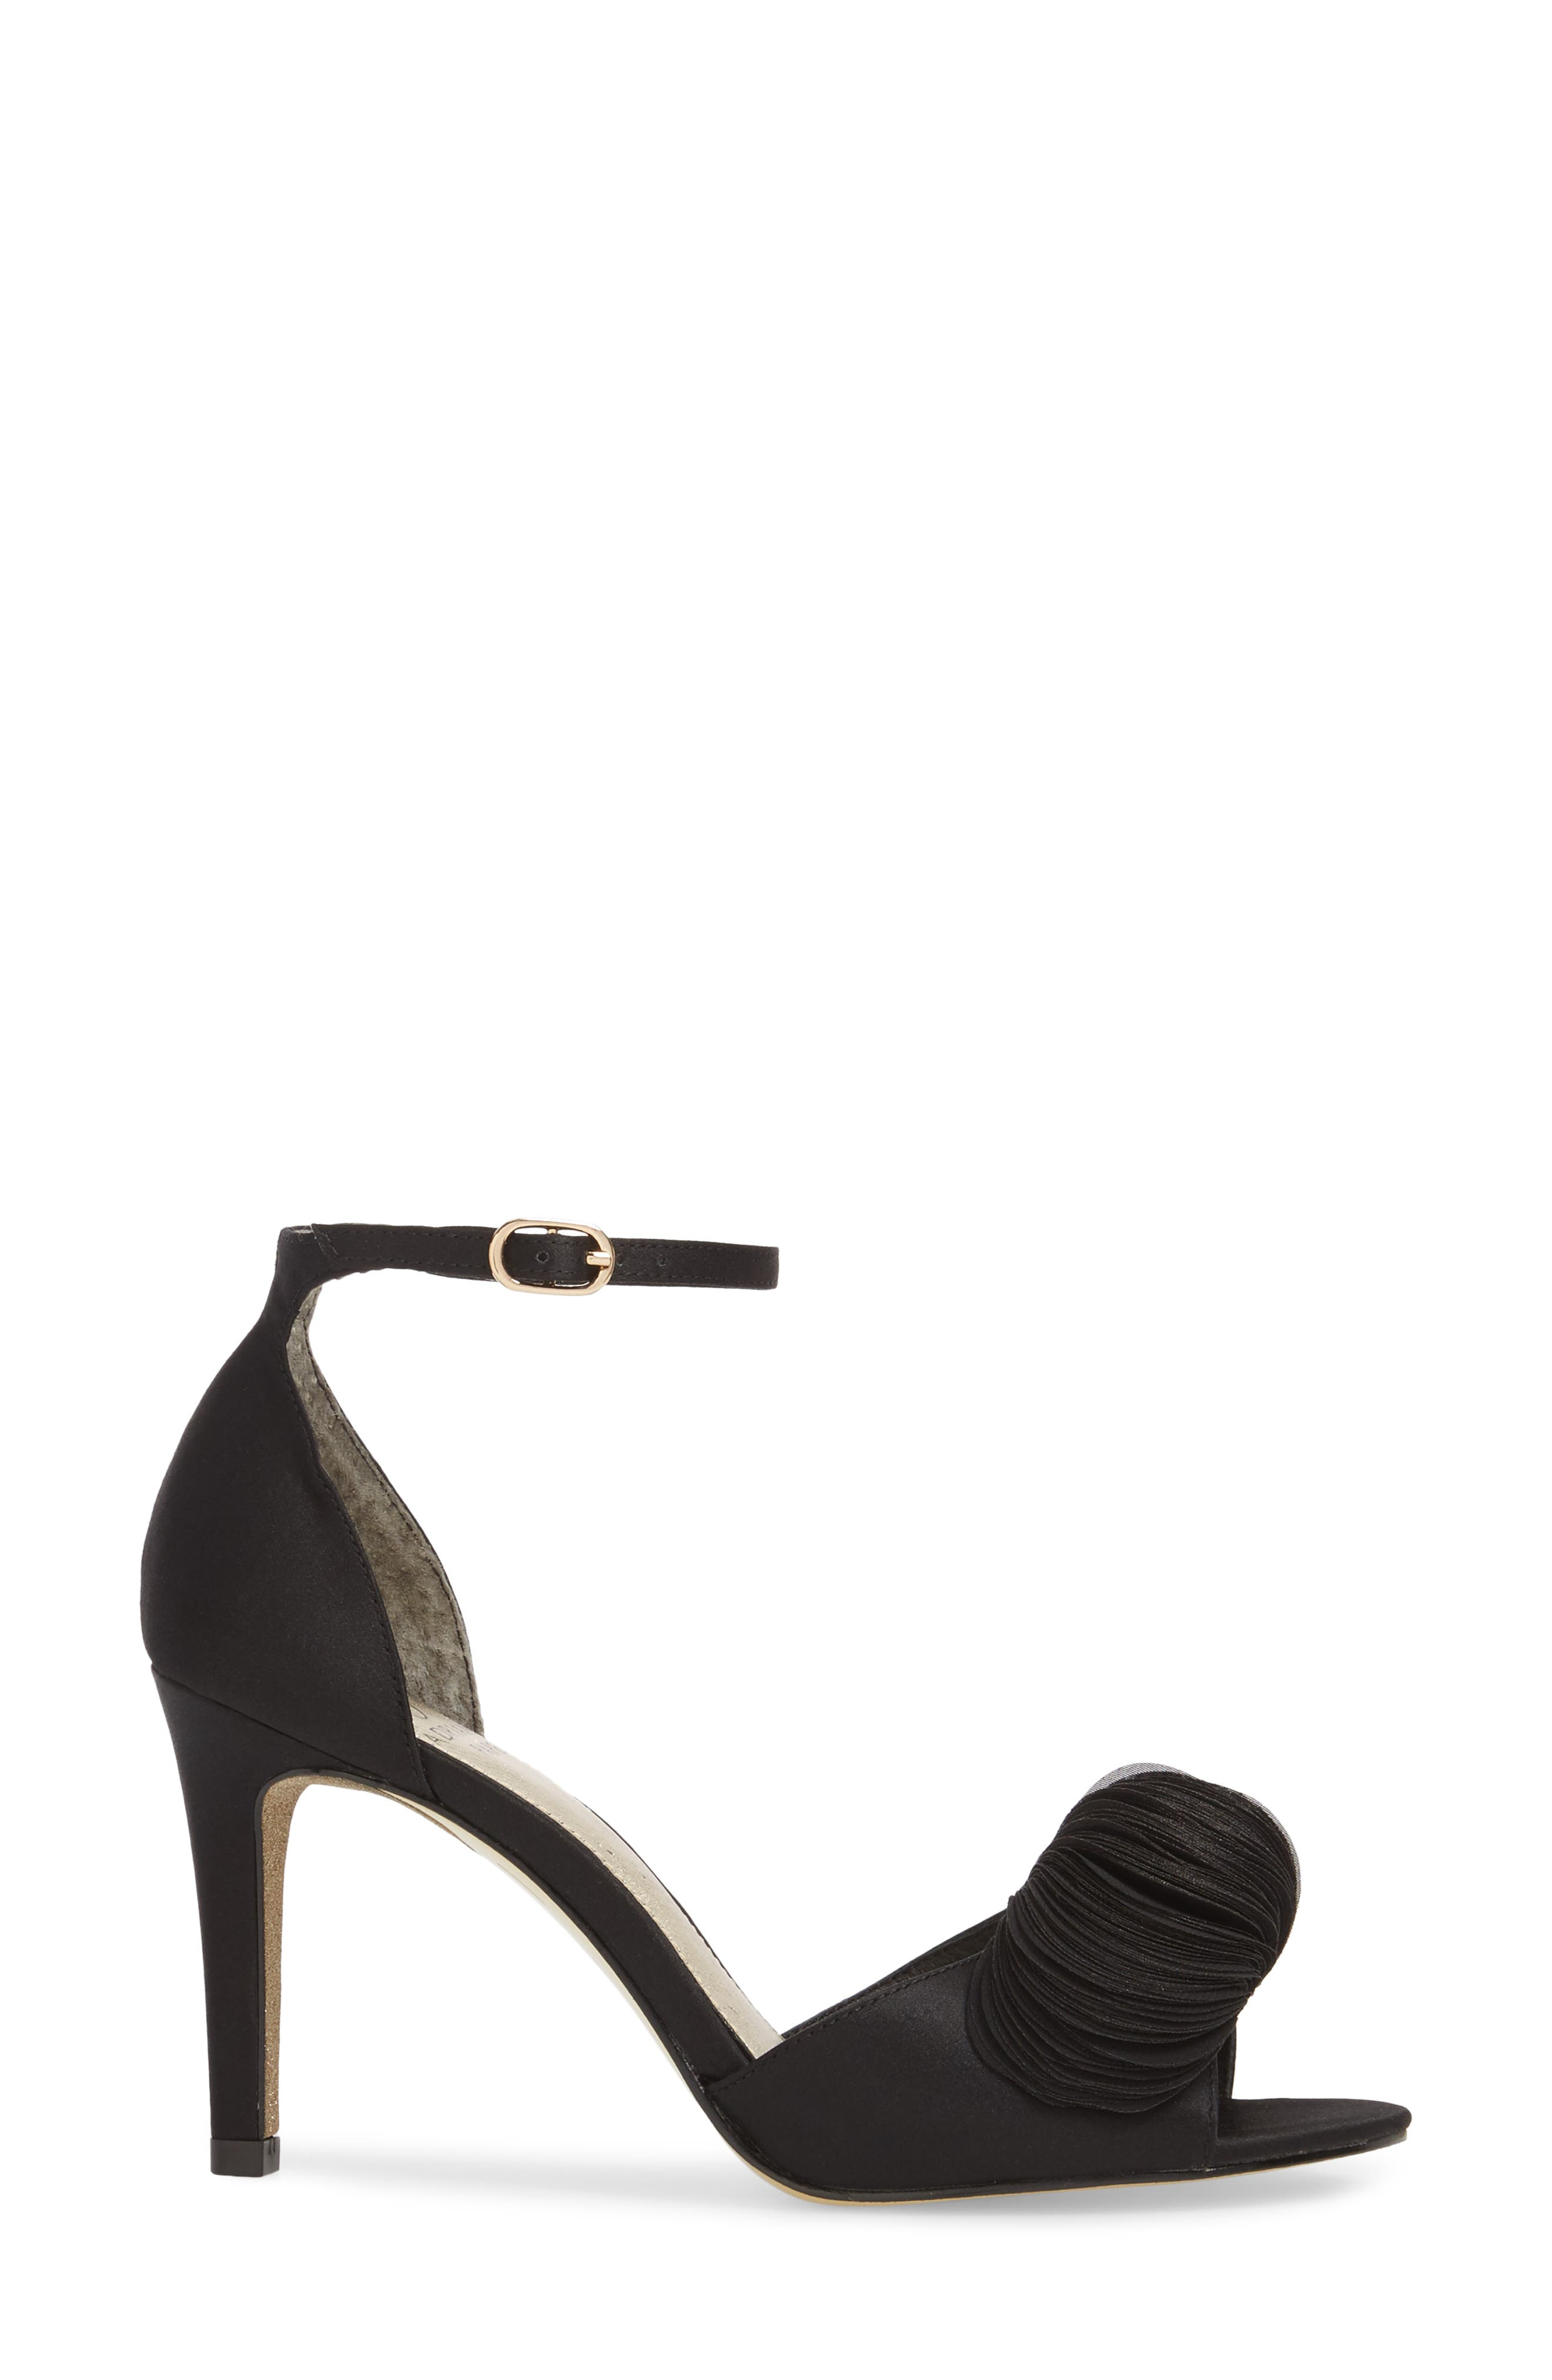 Gracie Ankle Strap Sandal,                             Alternate thumbnail 3, color,                             001